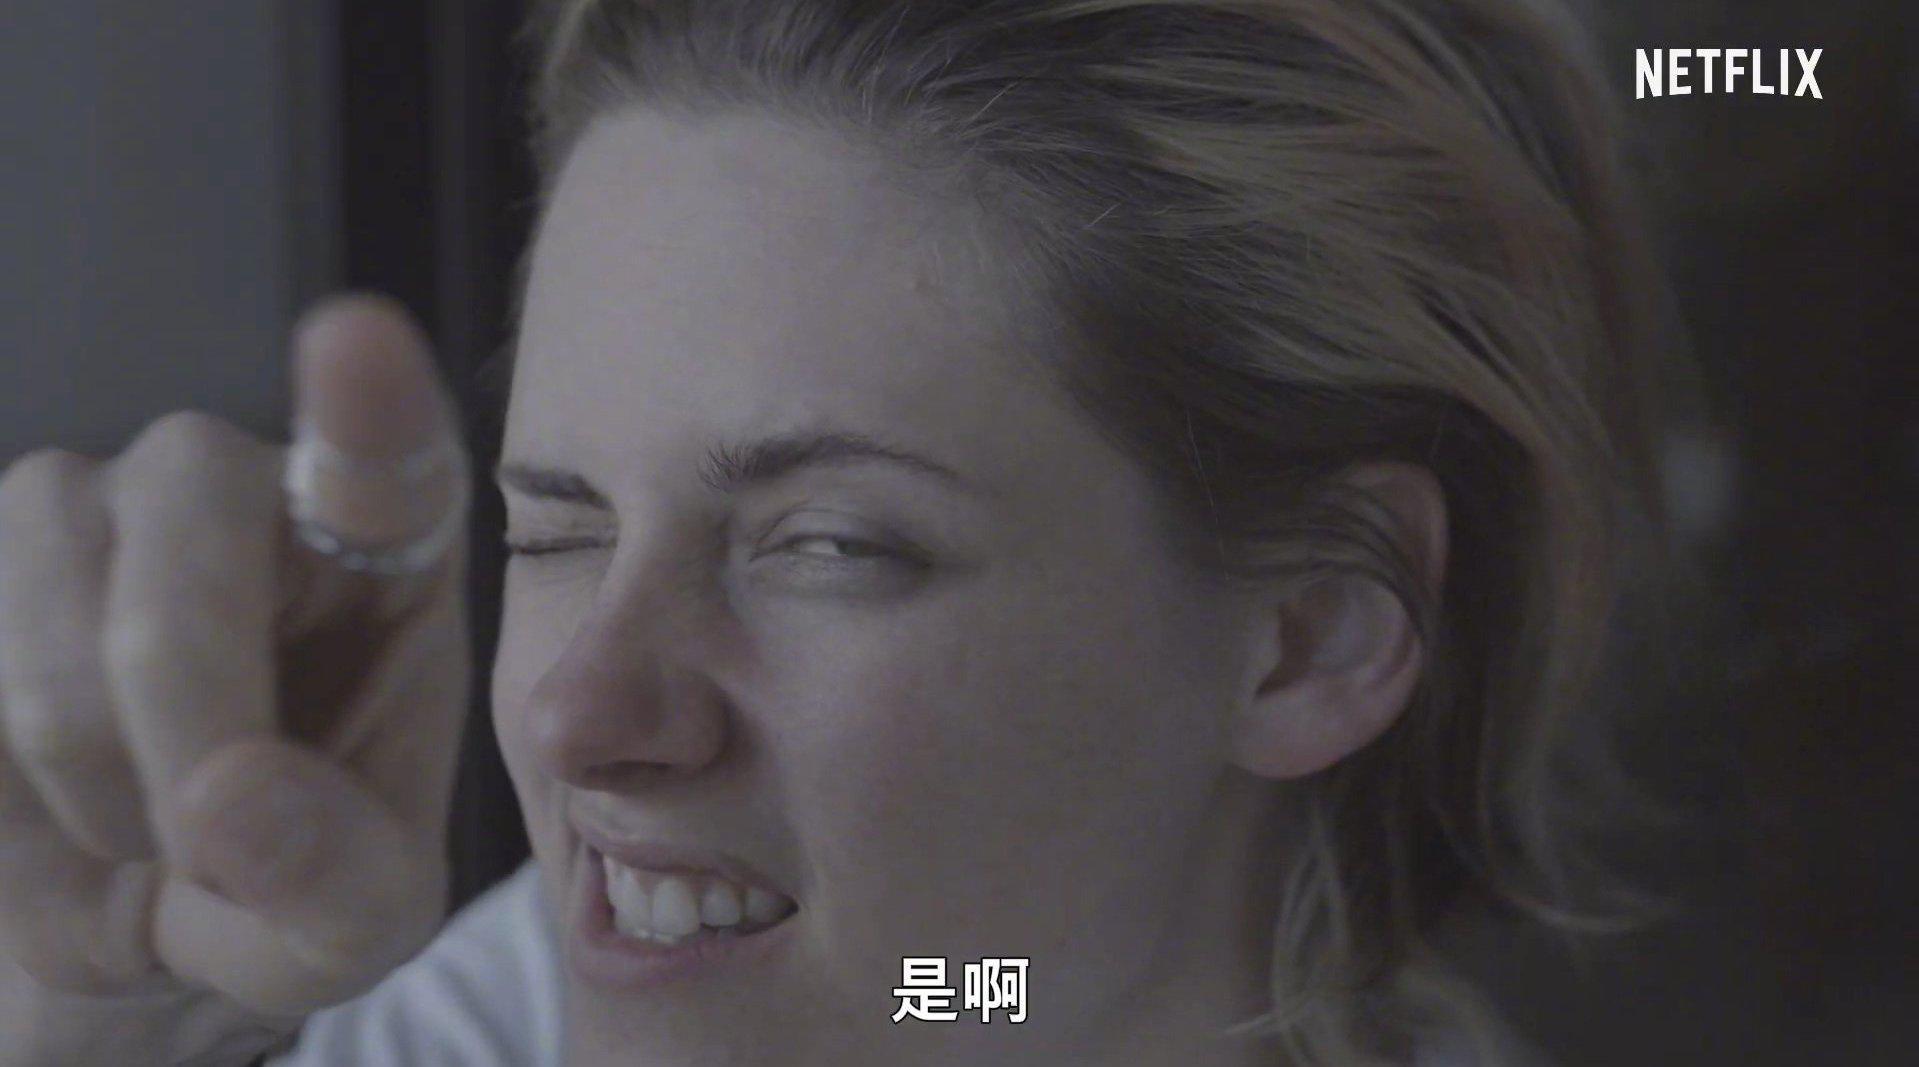 Kristen Stewart执导并出演Netflix新单元短剧《居家自制》首支中